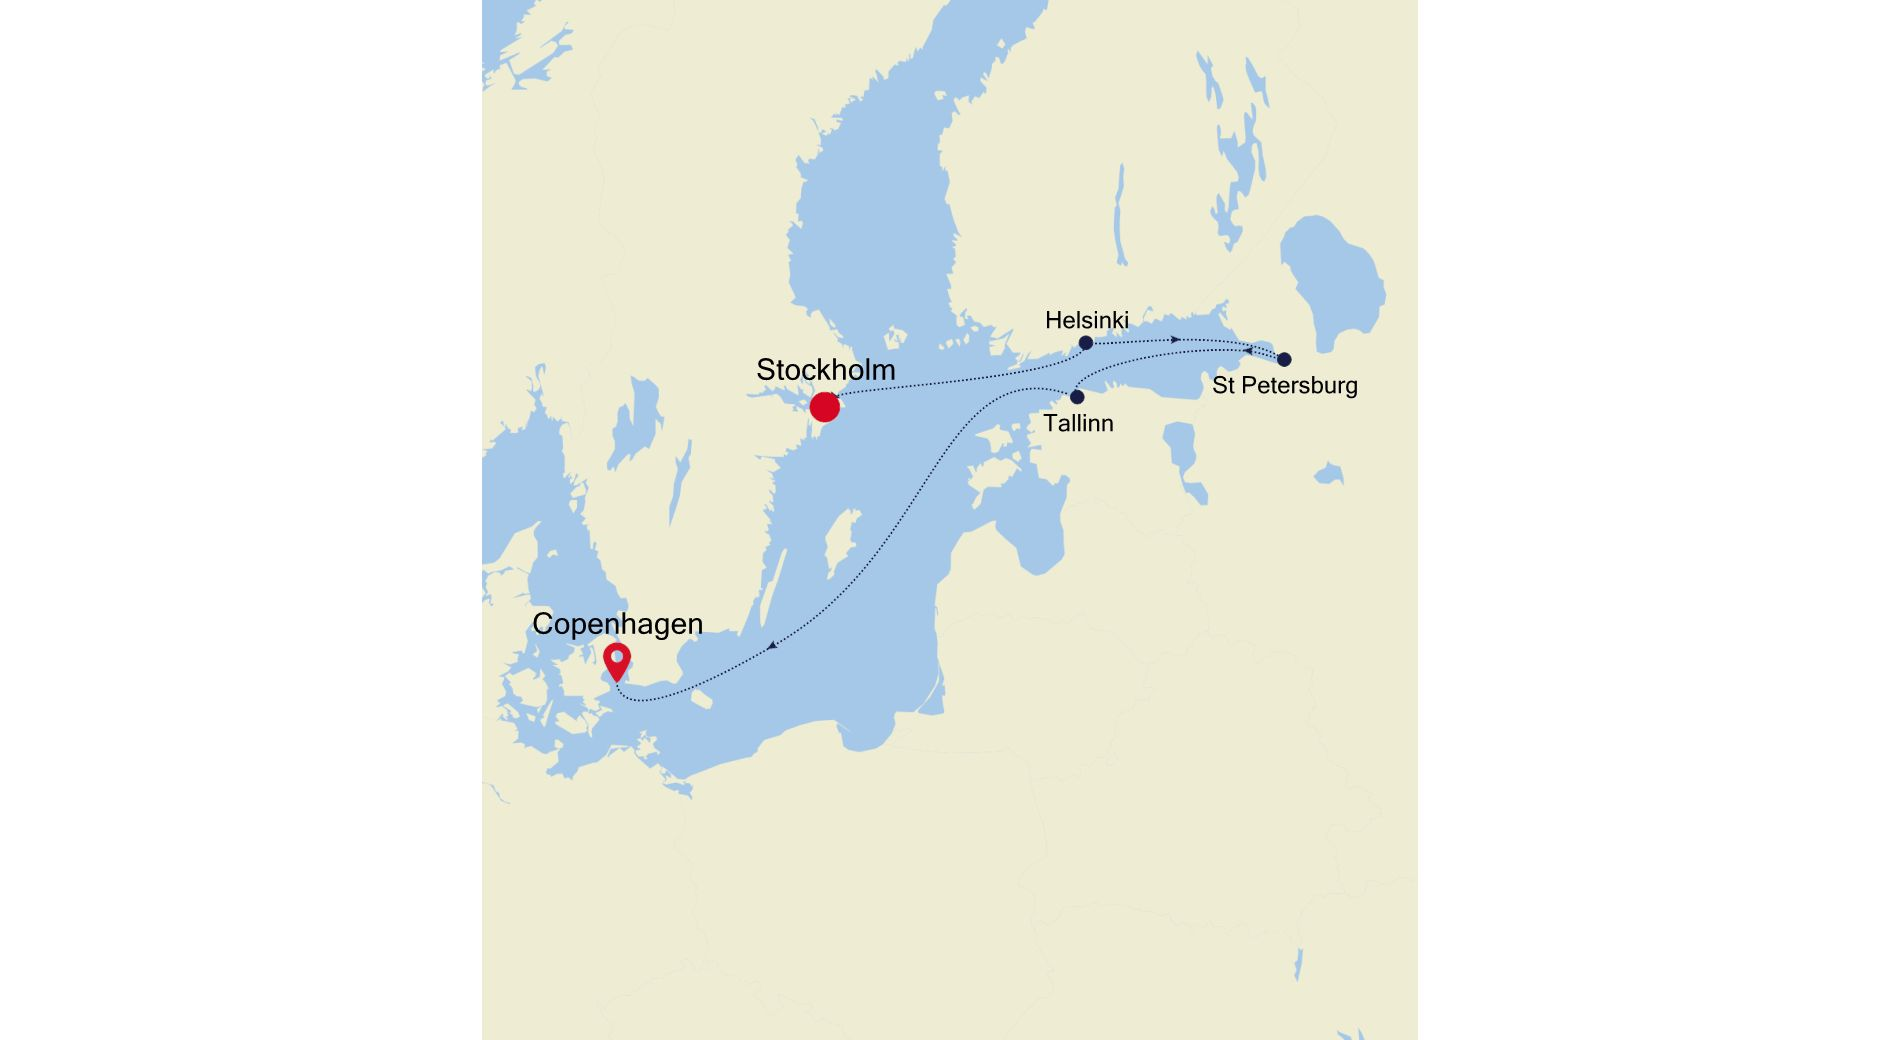 SL210816007 - Stockholm a Copenhagen